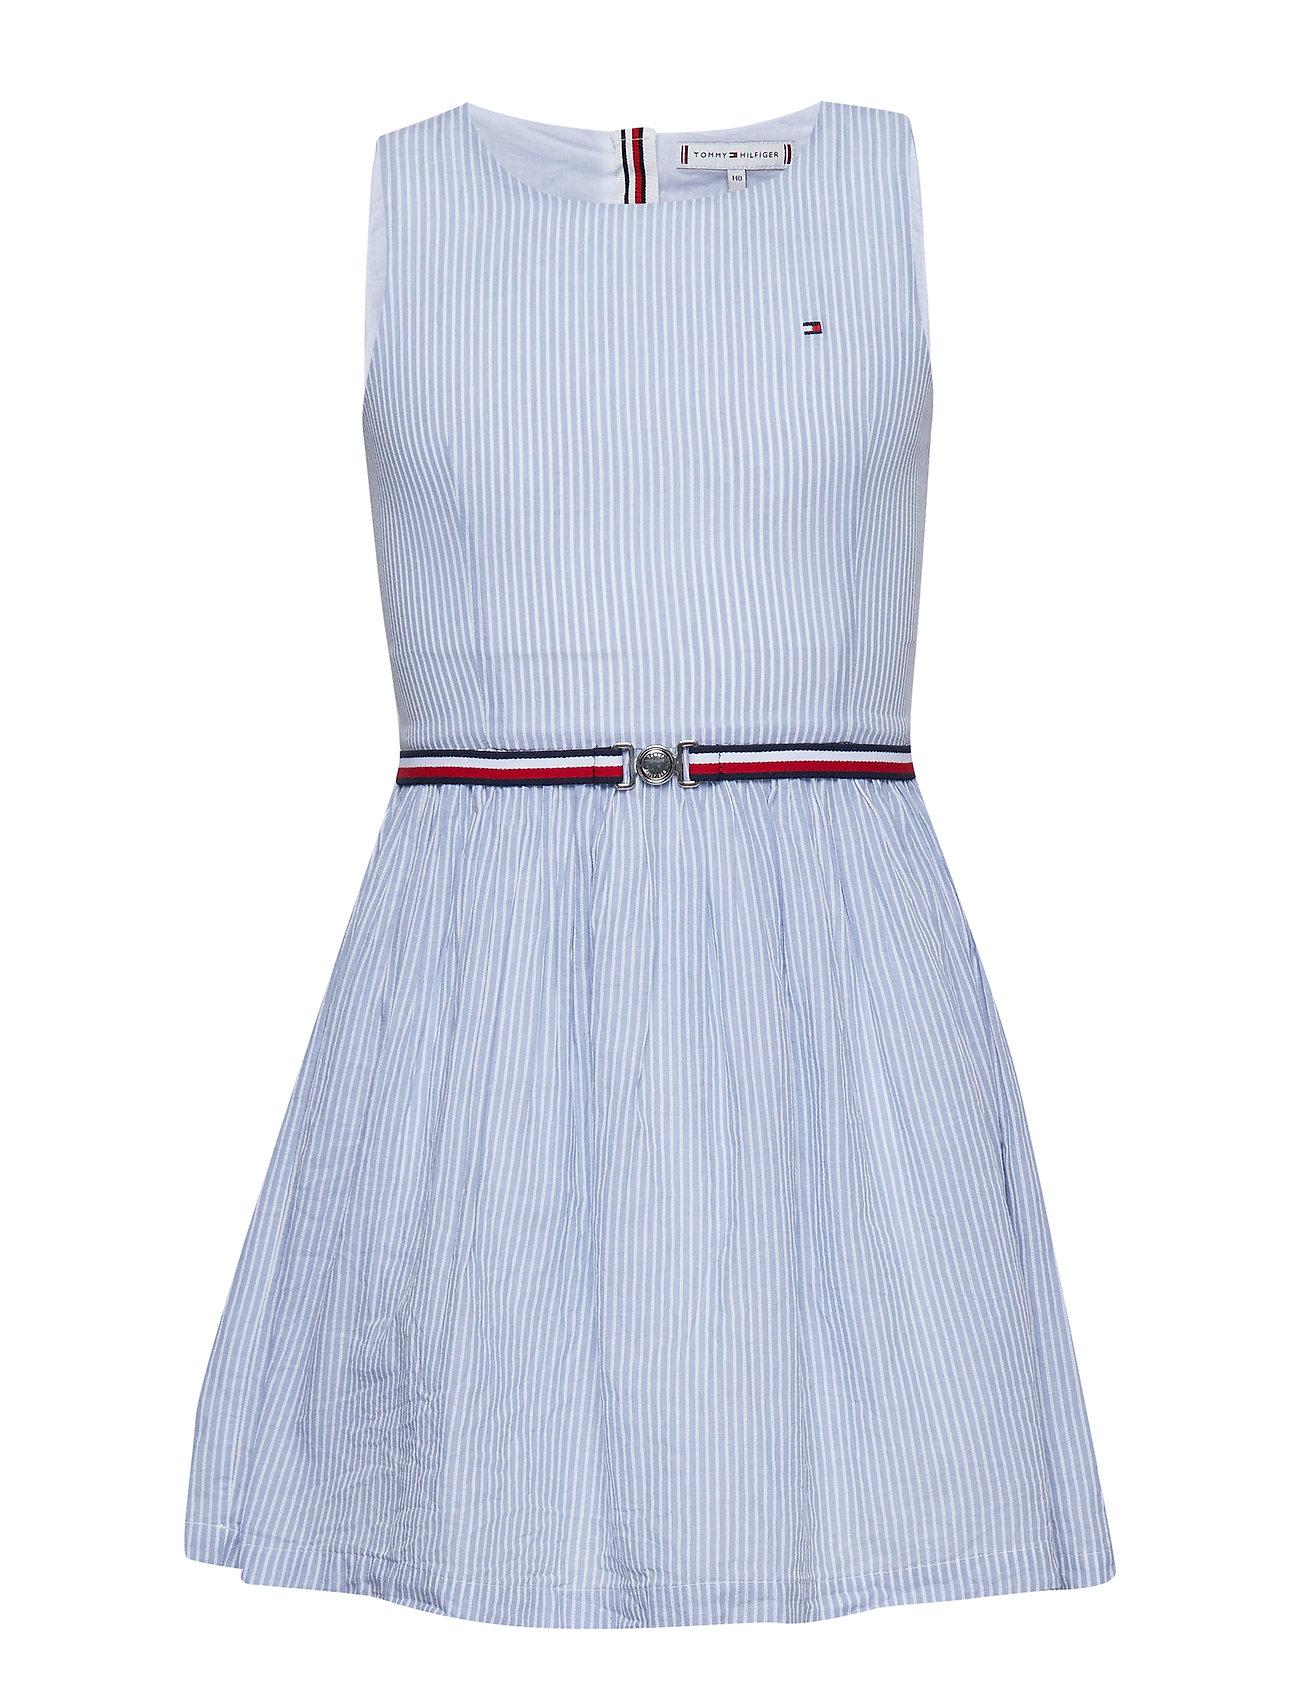 e9205f6963b BRIGHT WHITE Tommy Hilfiger Enchanting Stripe Dr kjoler for børn ...